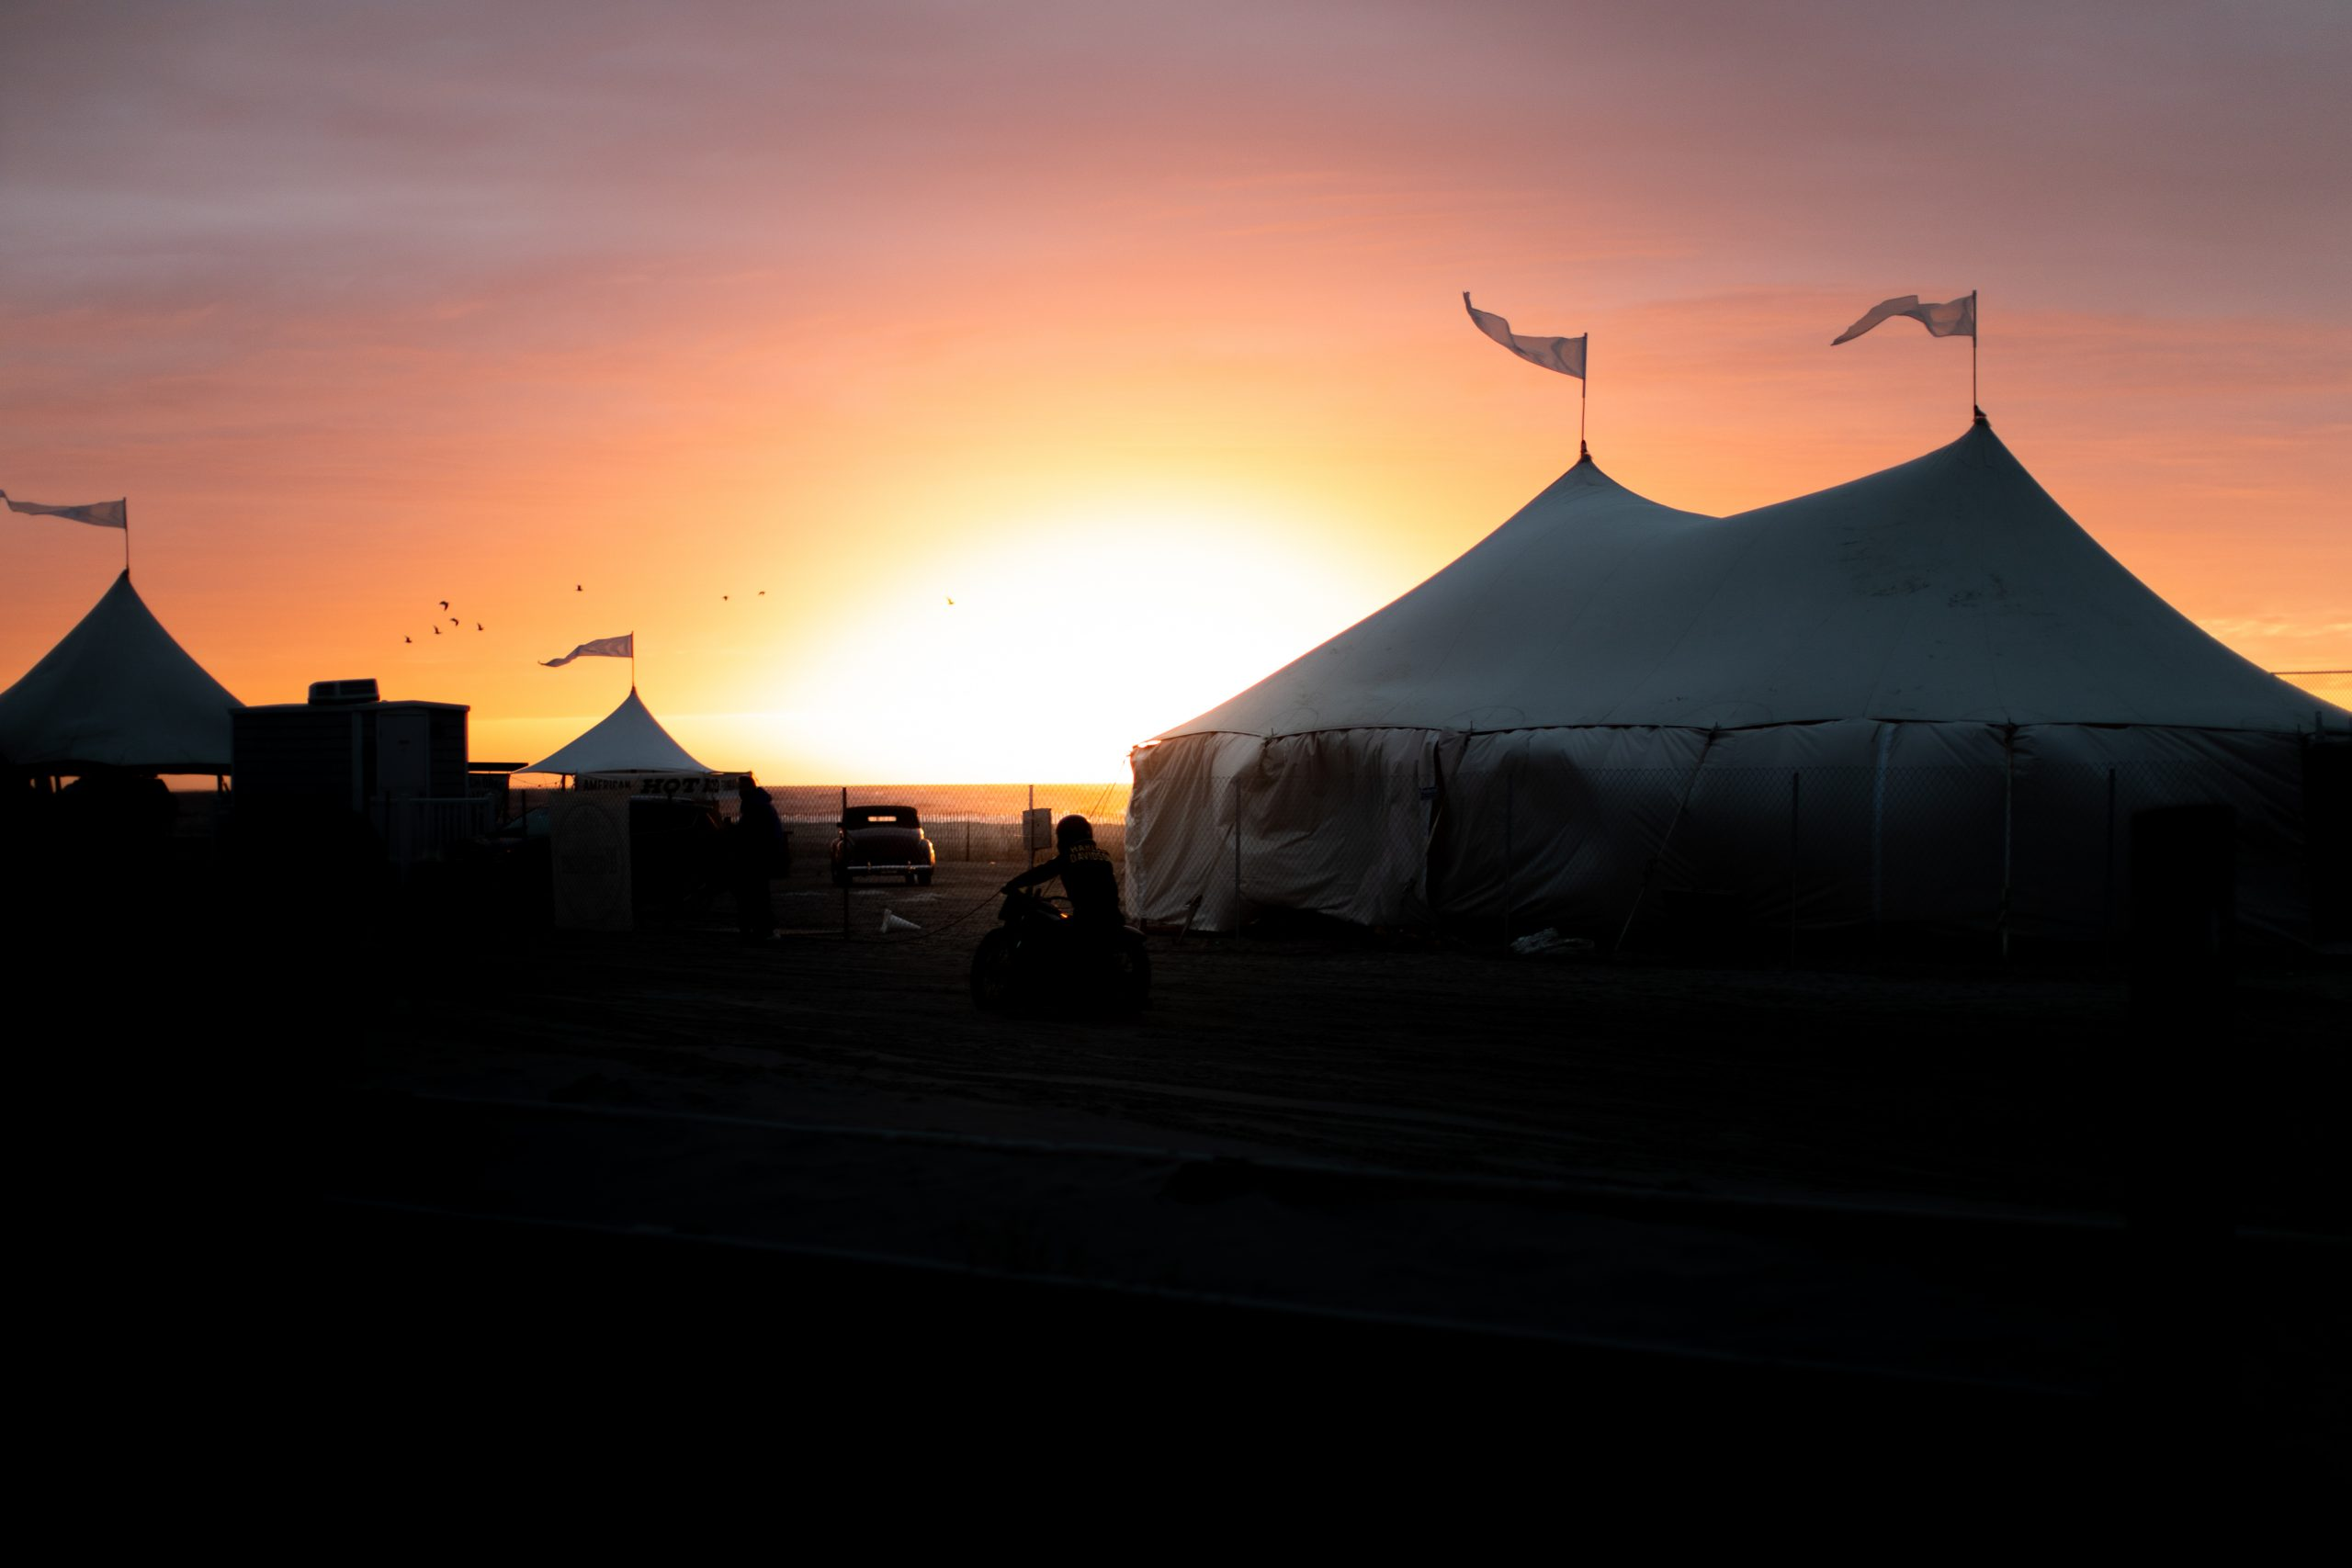 motorbike beach drag race tent sunset